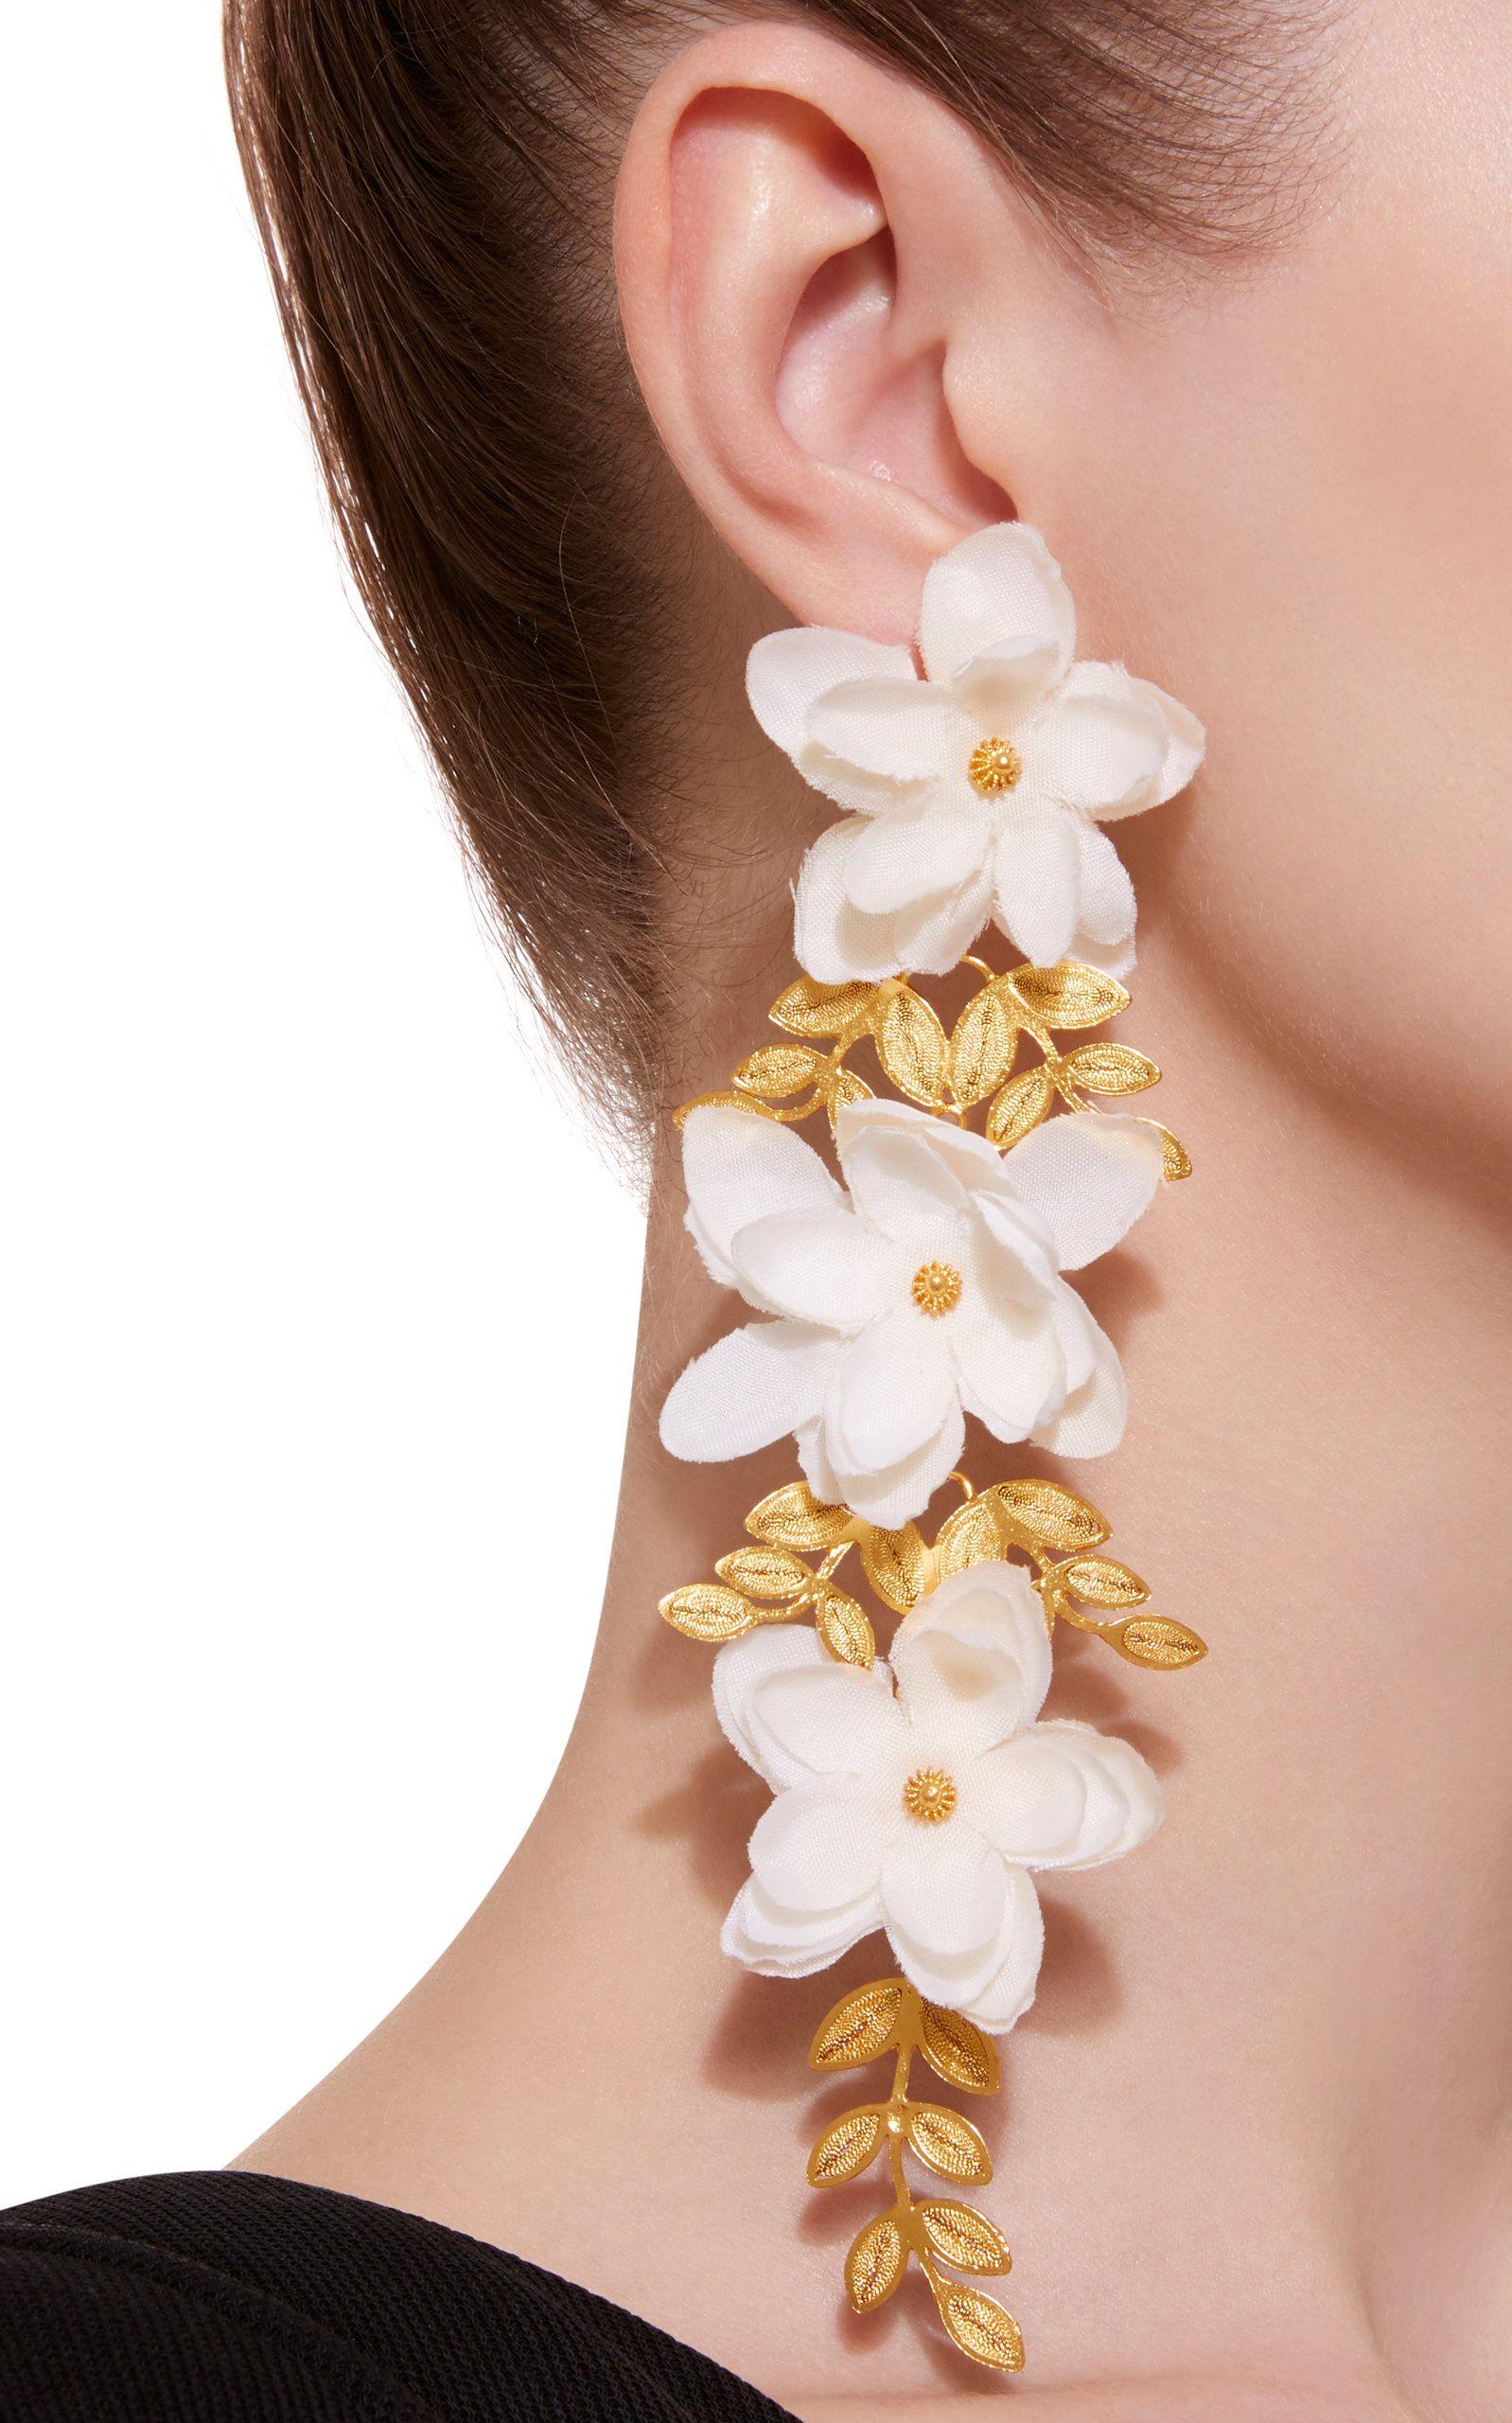 Mallarino Gaby Gold Vermeil Silk Earrings QN6Wvd7